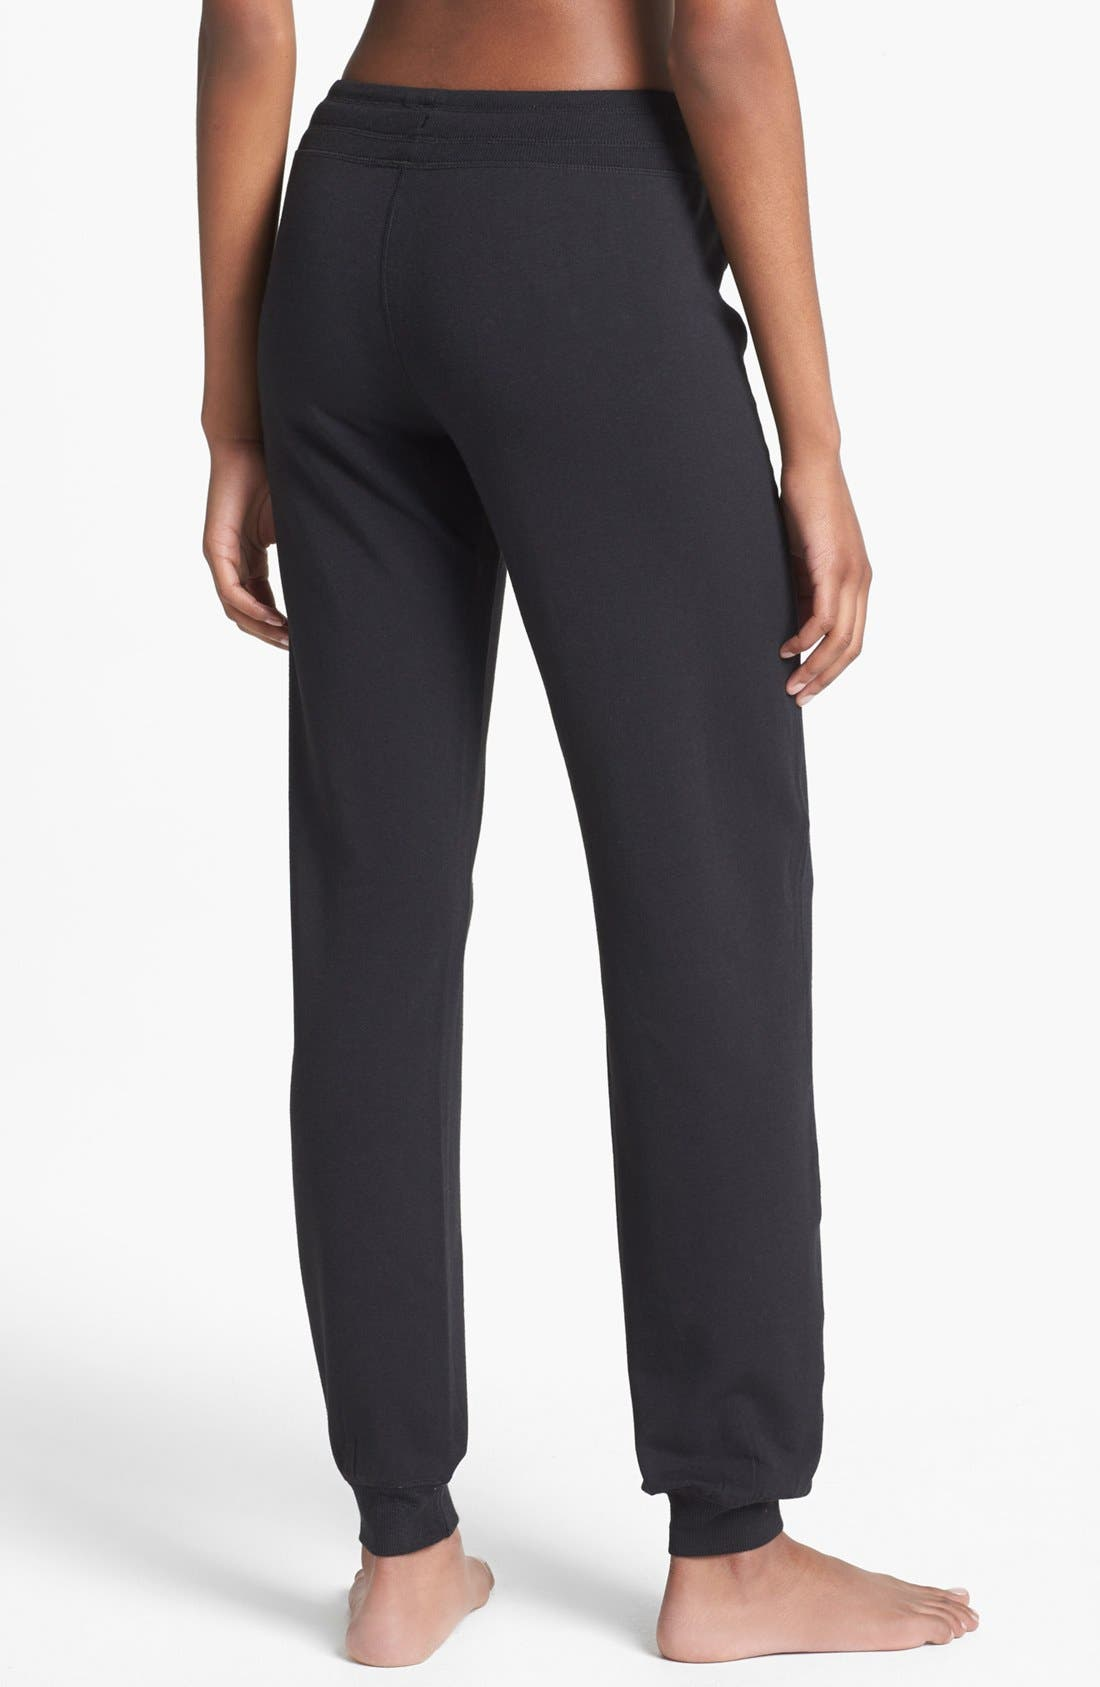 Alternate Image 2  - Alo 'Cozy' Slim Sweatpants